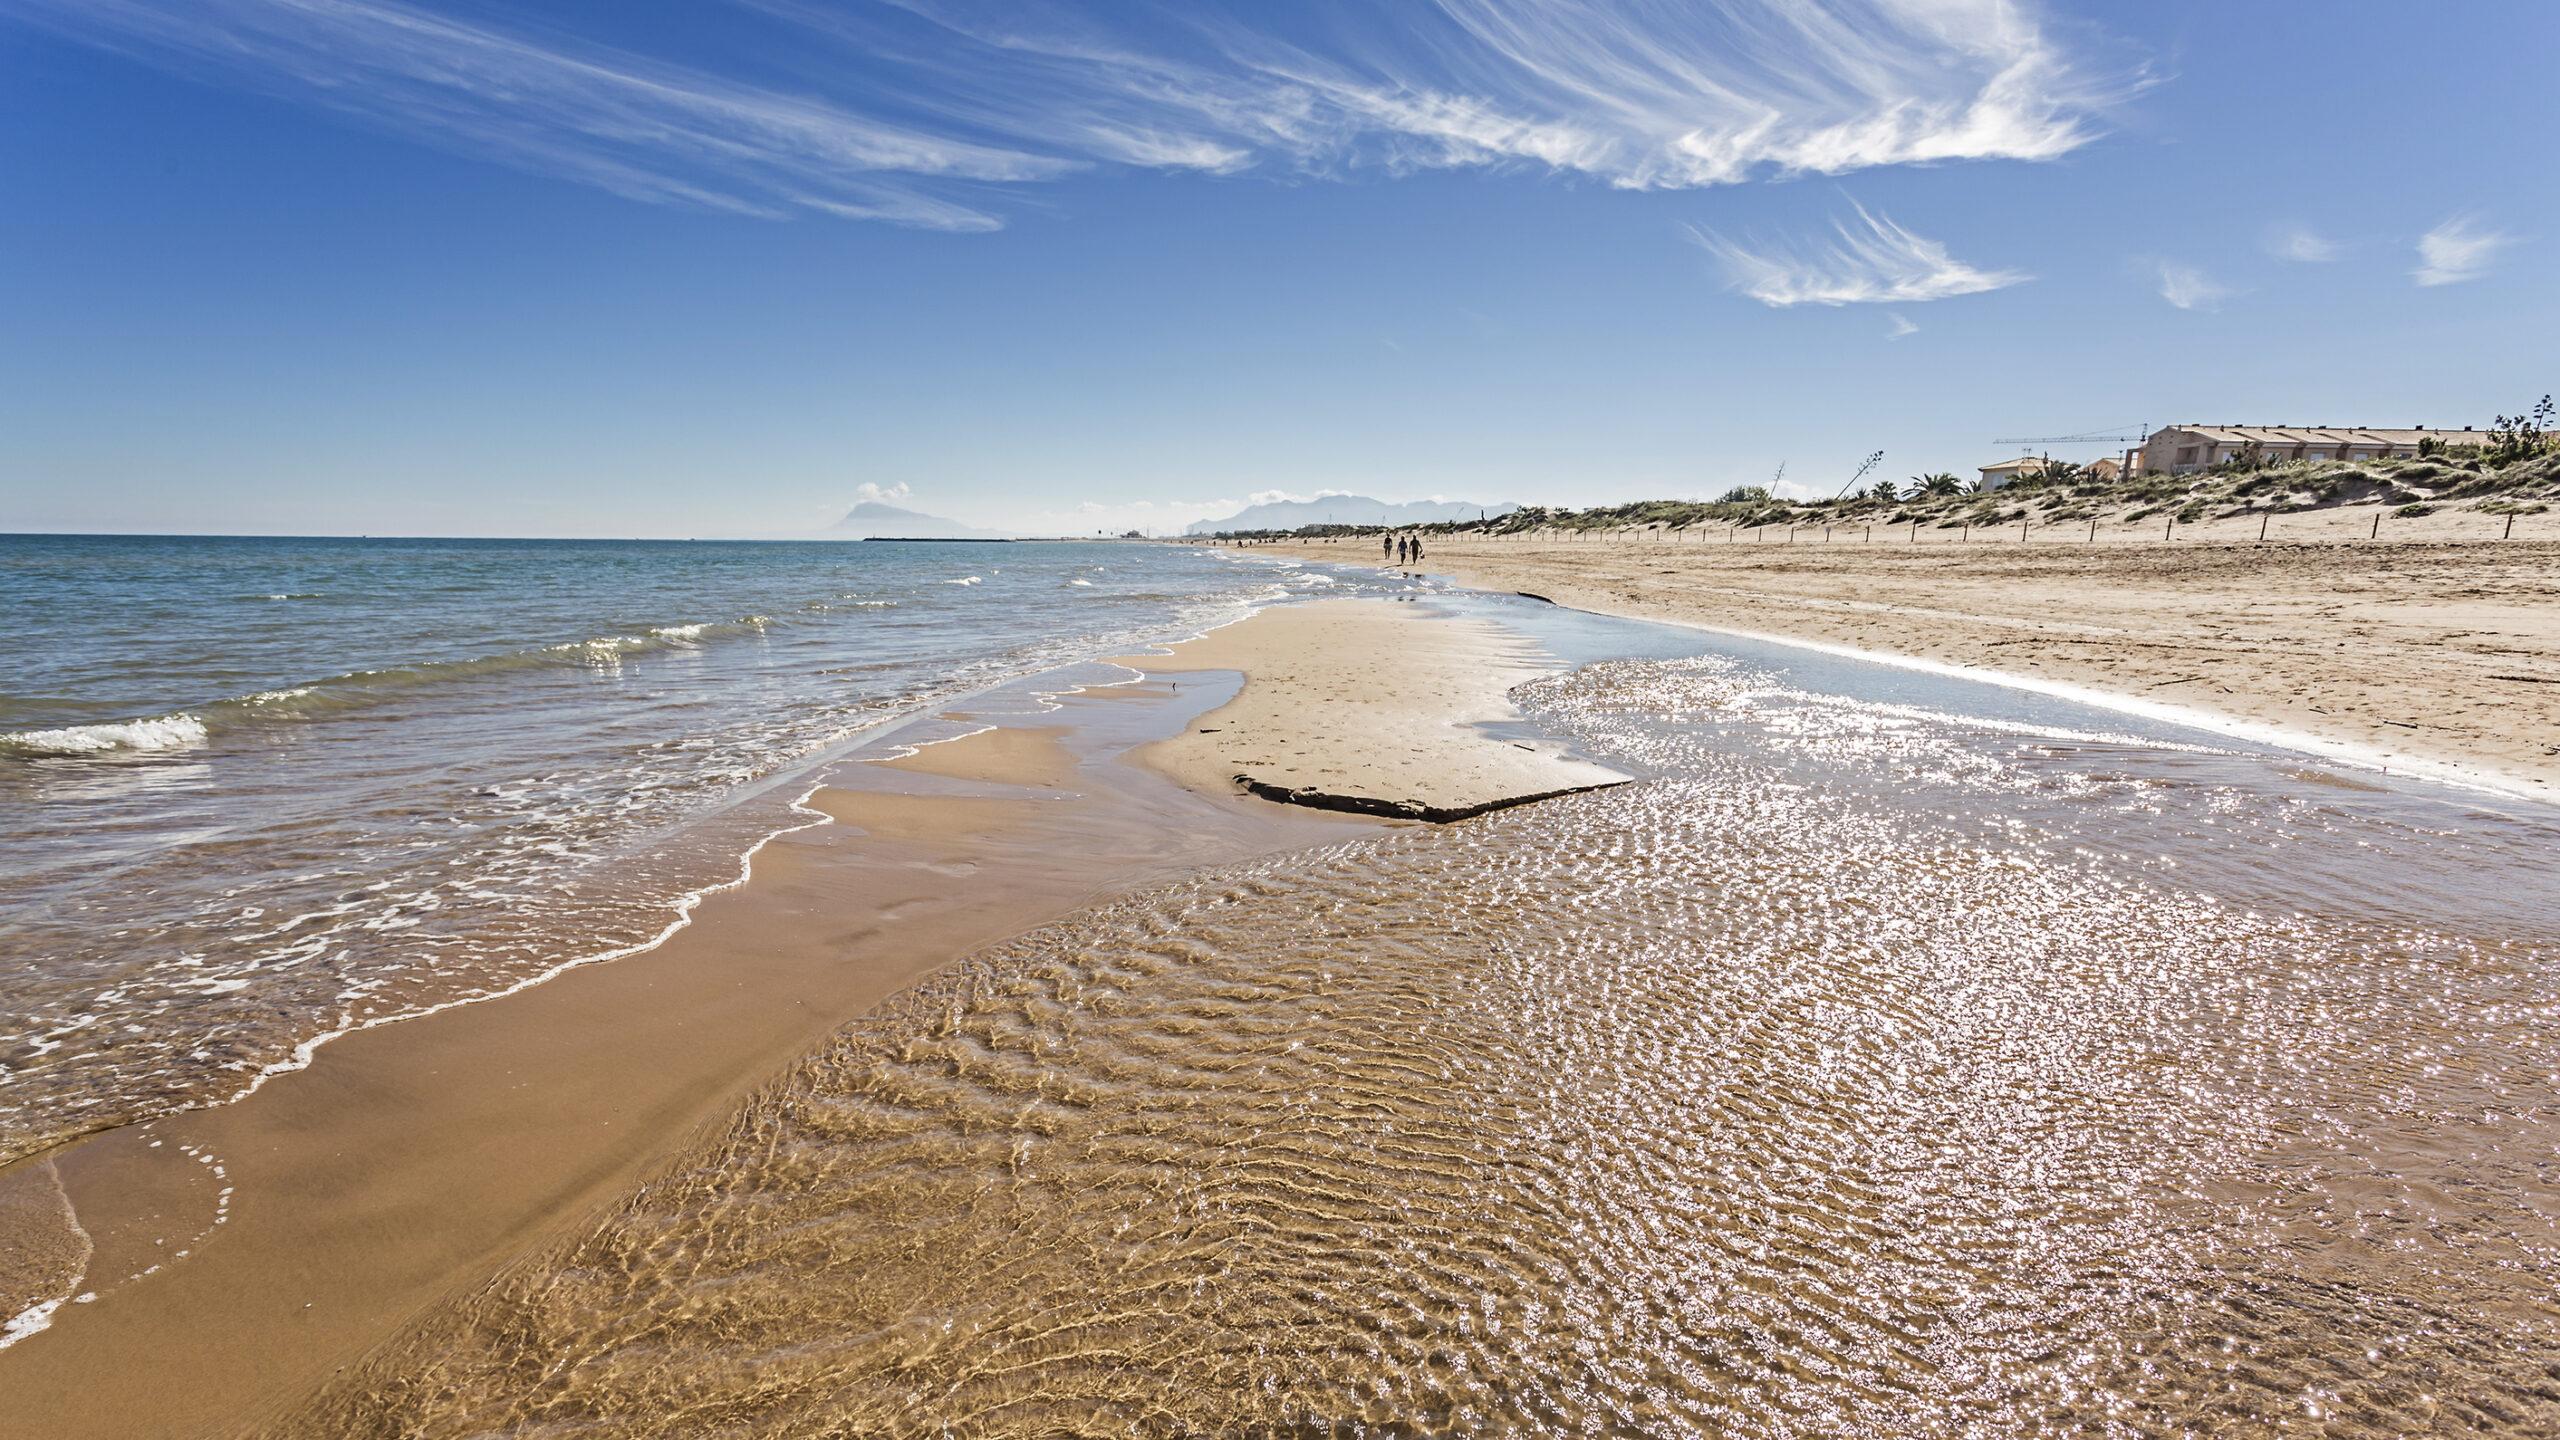 playa valencia mediterranean spain scaled